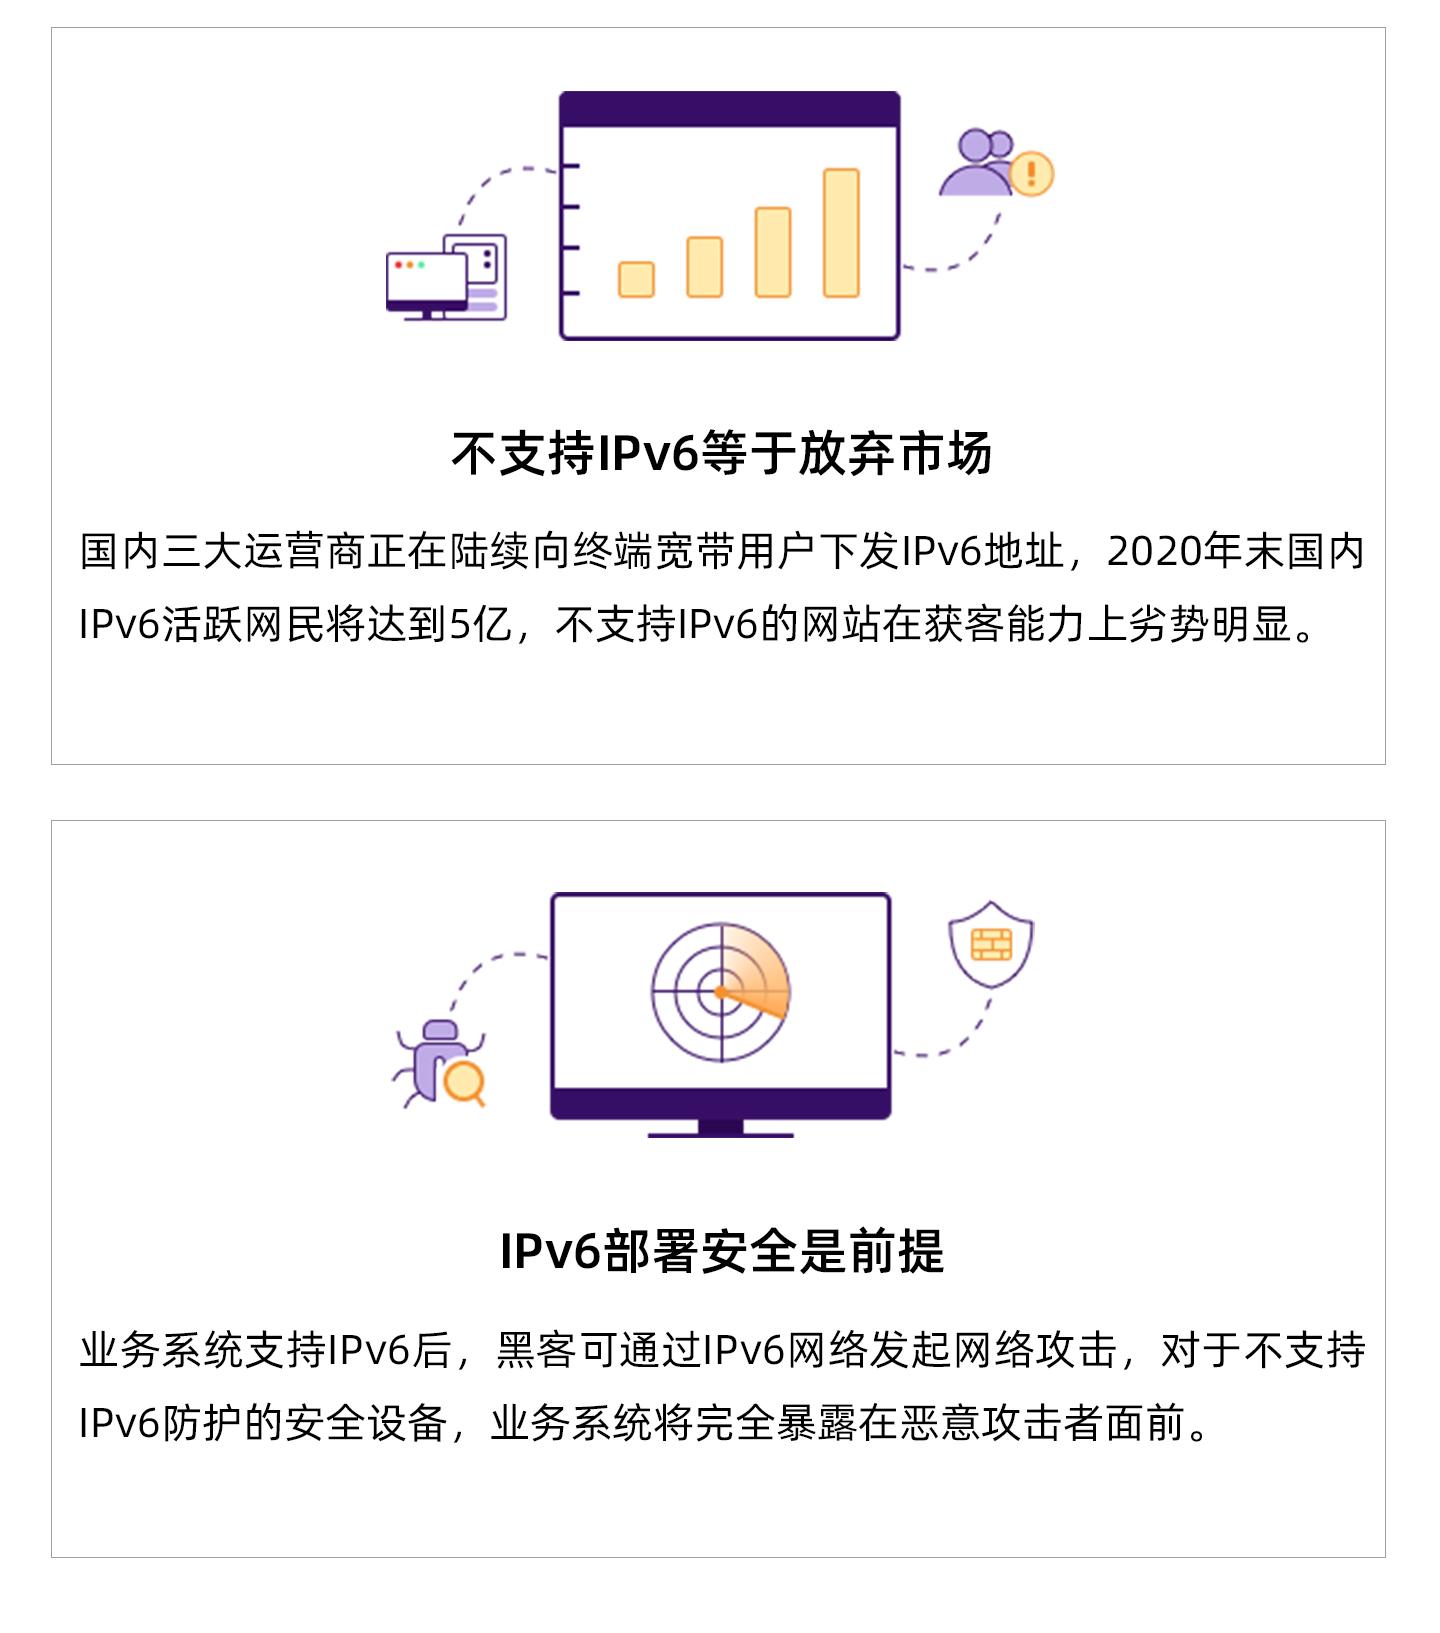 IPv6安全改造1440_03.jpg